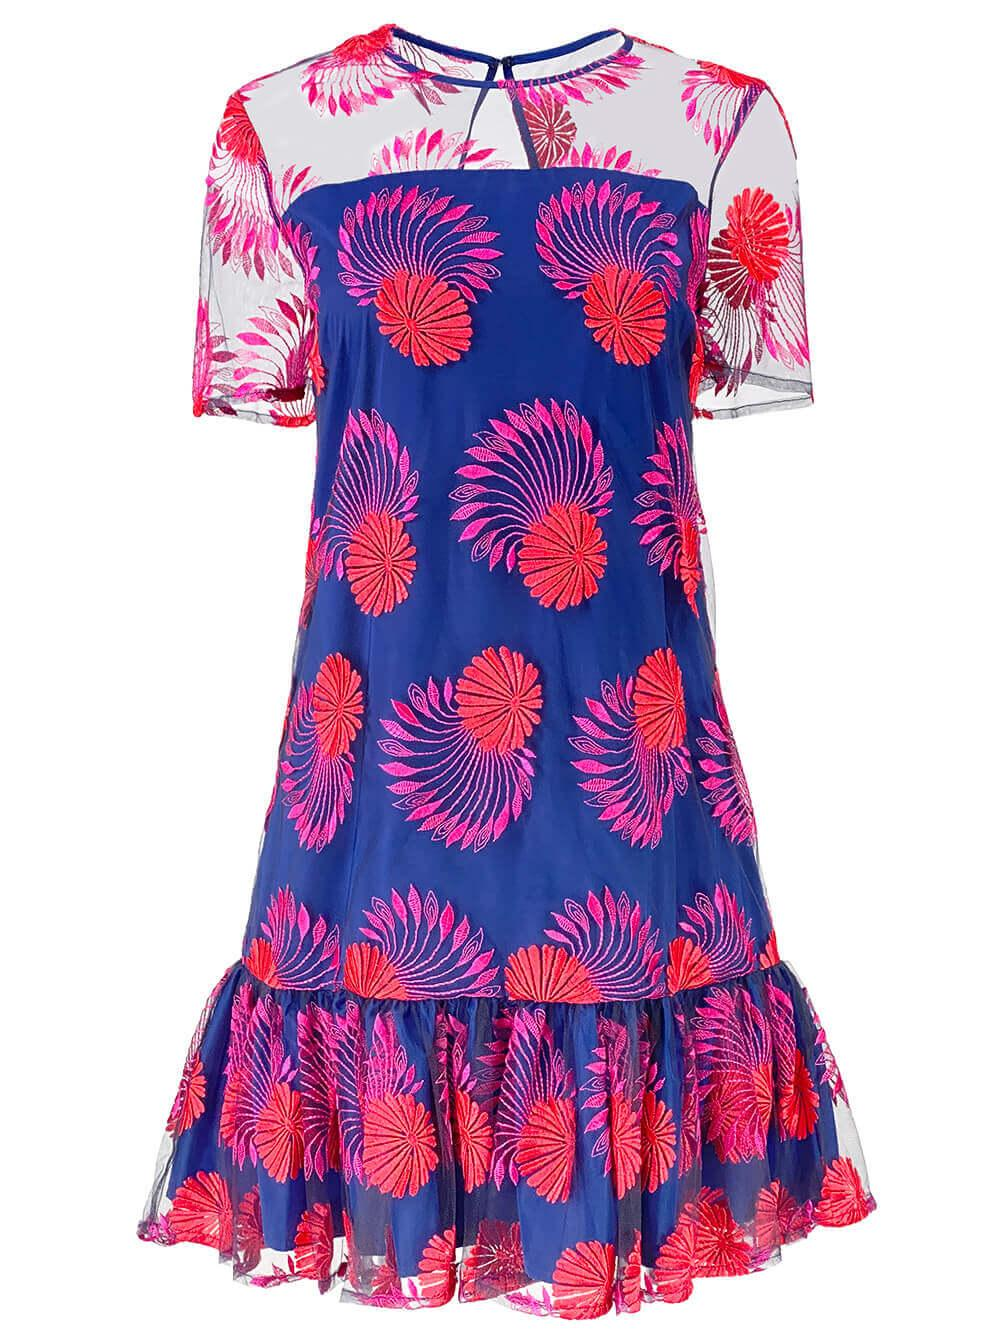 Abstract Dress Item # 2105320EM1